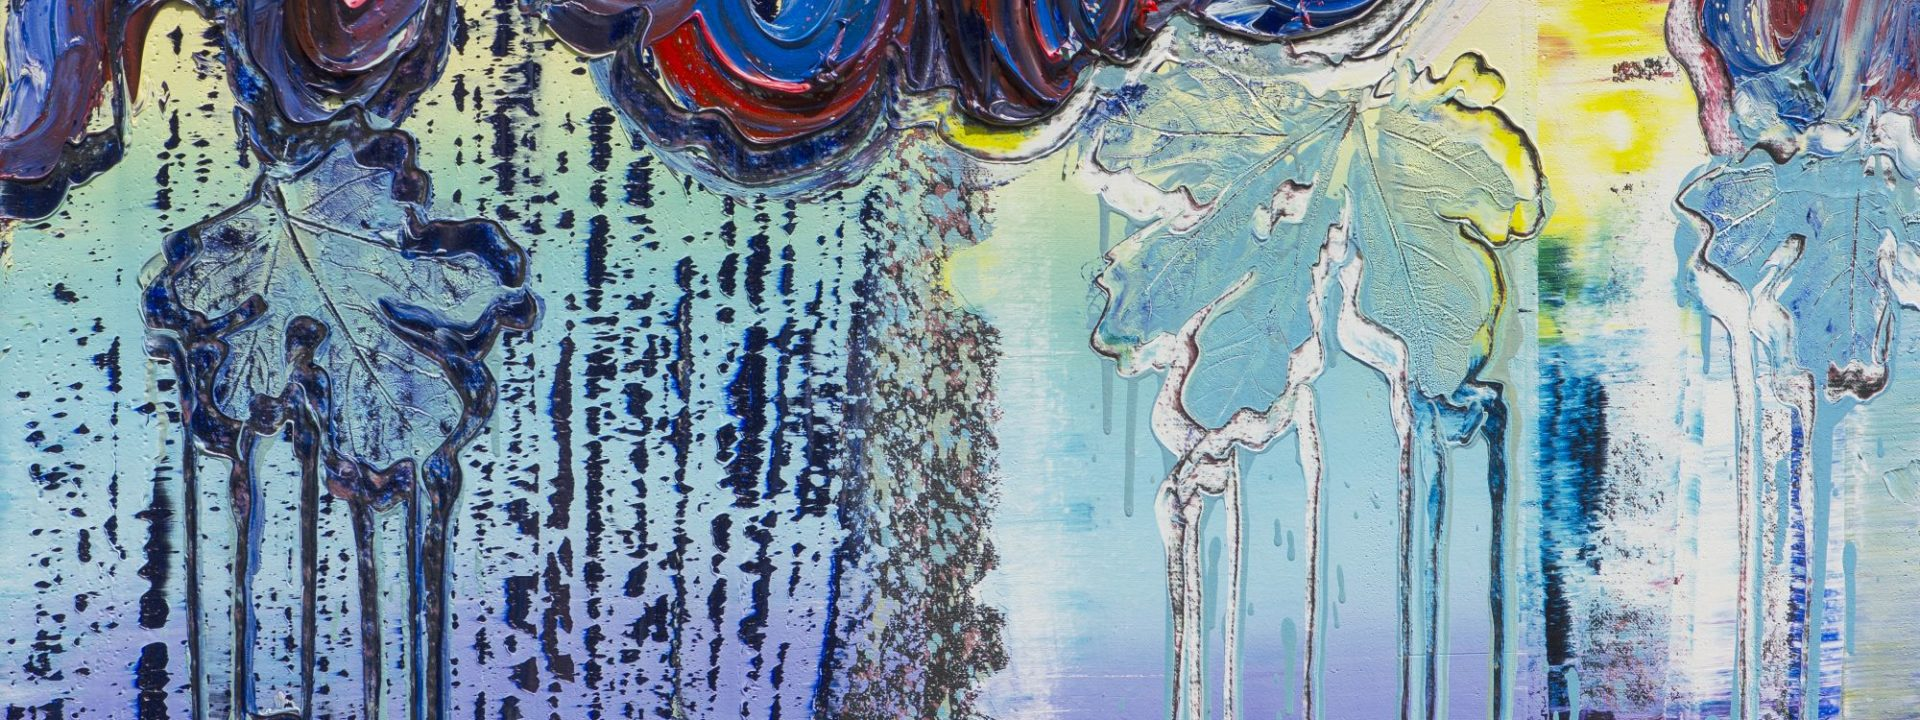 Brixy, Werkserie Horizon, 80 x 80